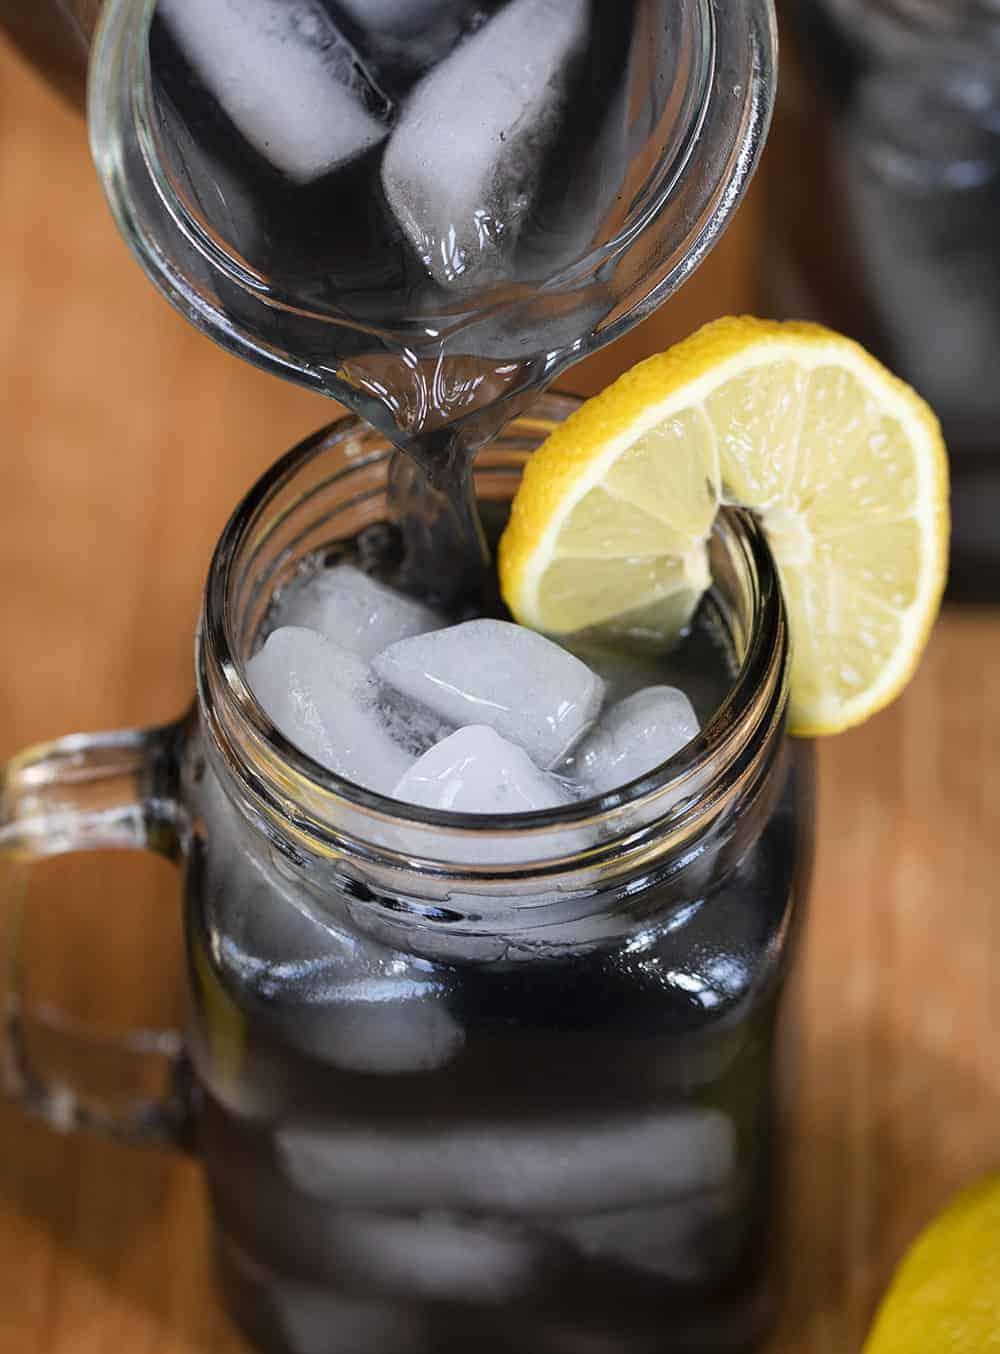 Pouring Charcoal Lemonade